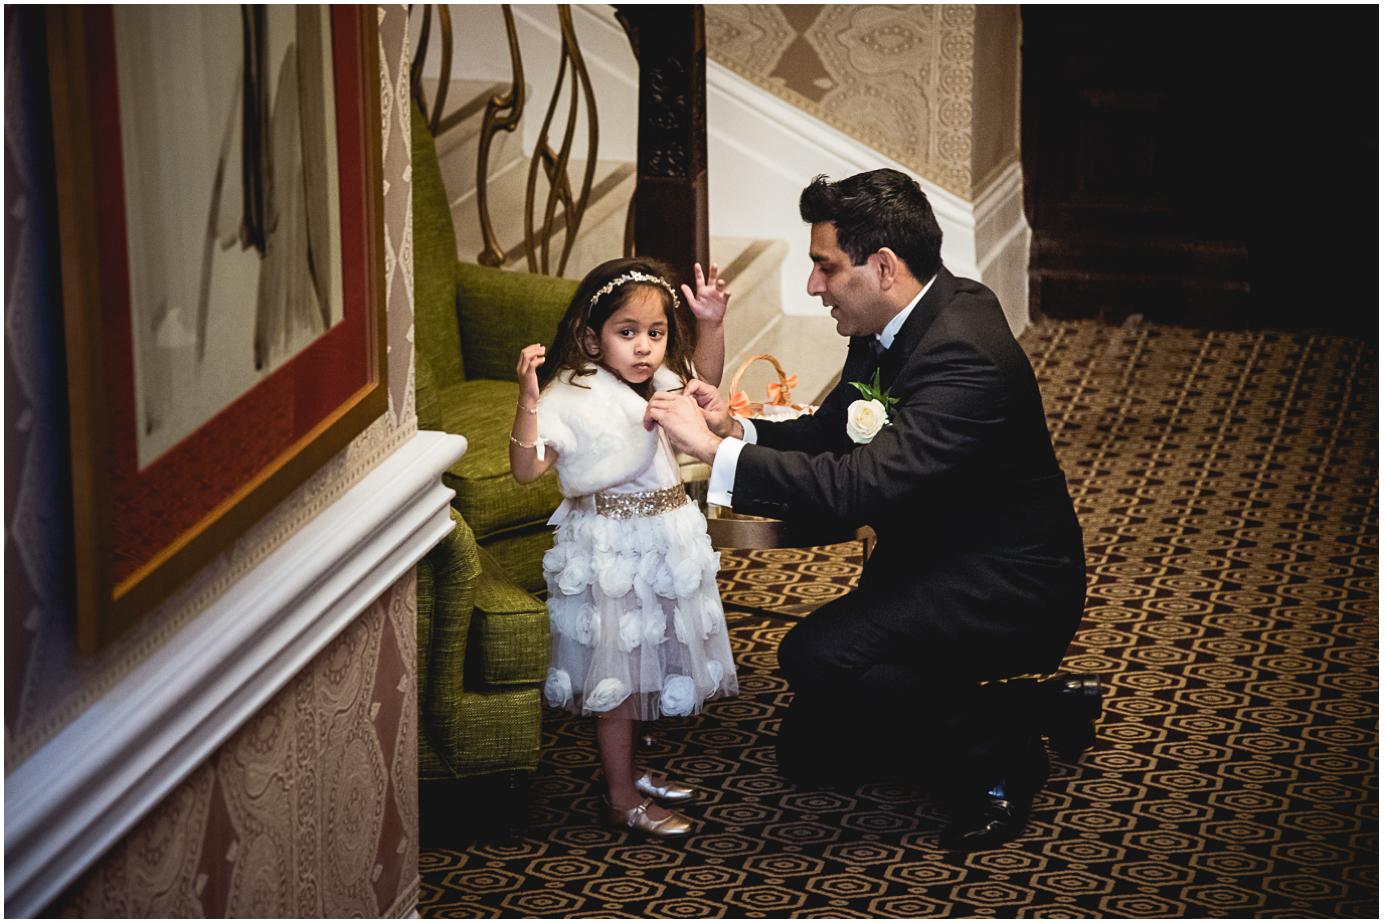 28 - Esmat and Angus - St. Ermin's Hotel London wedding photographer